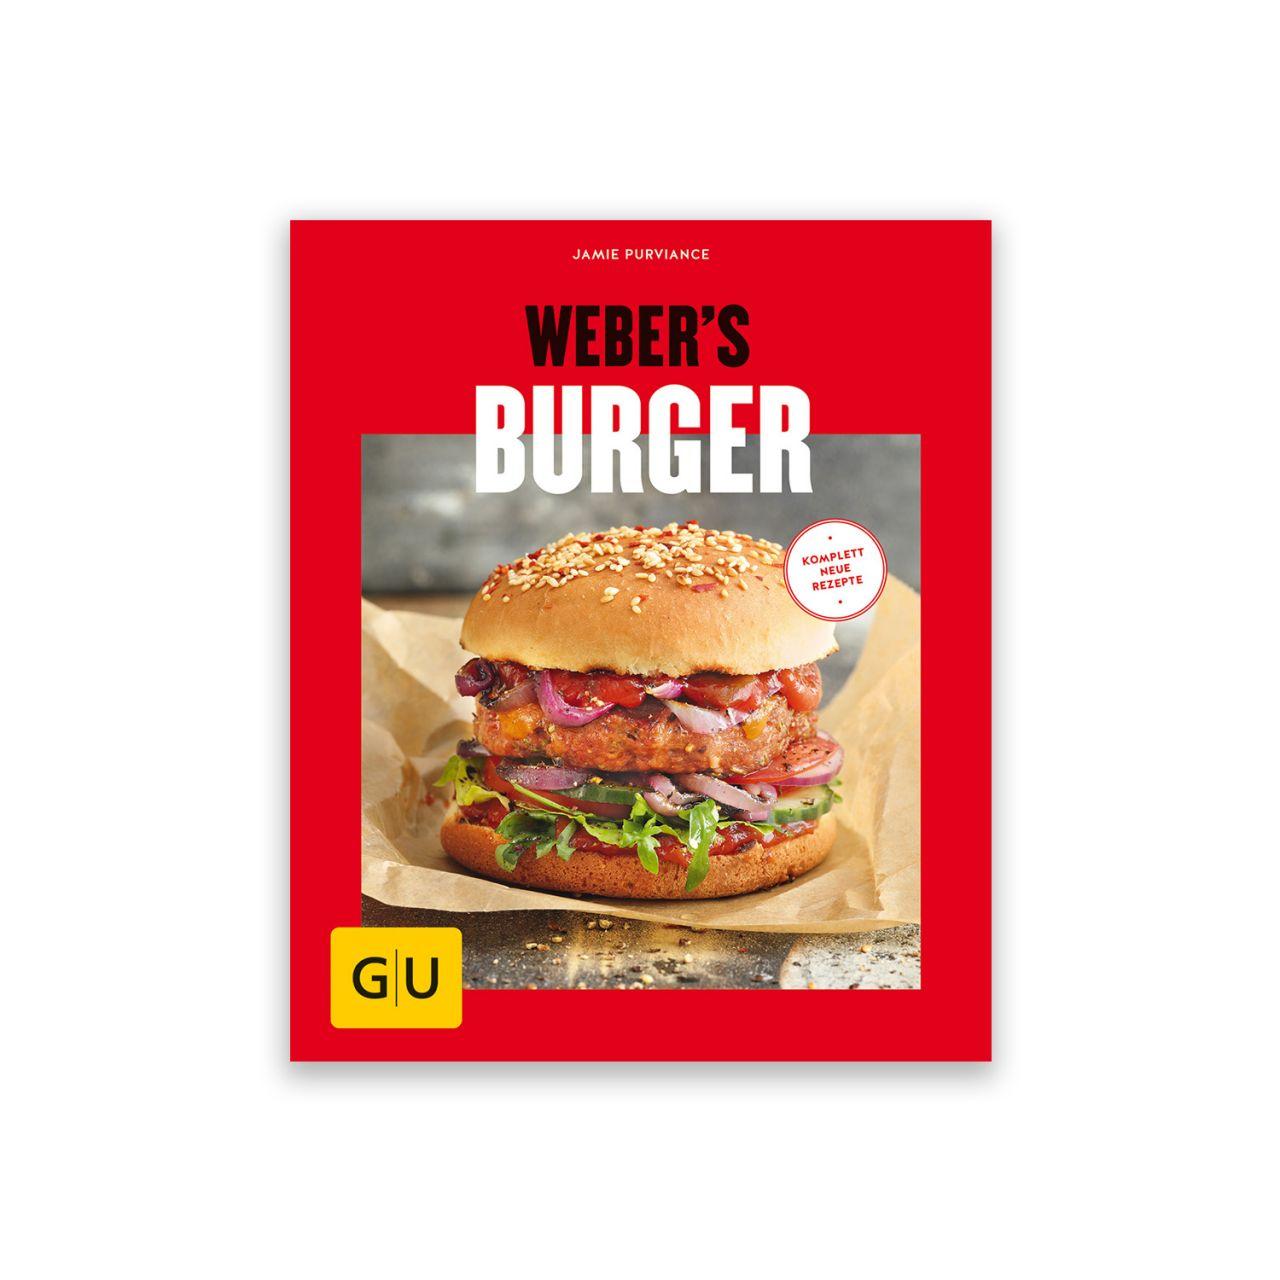 Grillbuch Weber's Burger 978-3-8338-6537-4